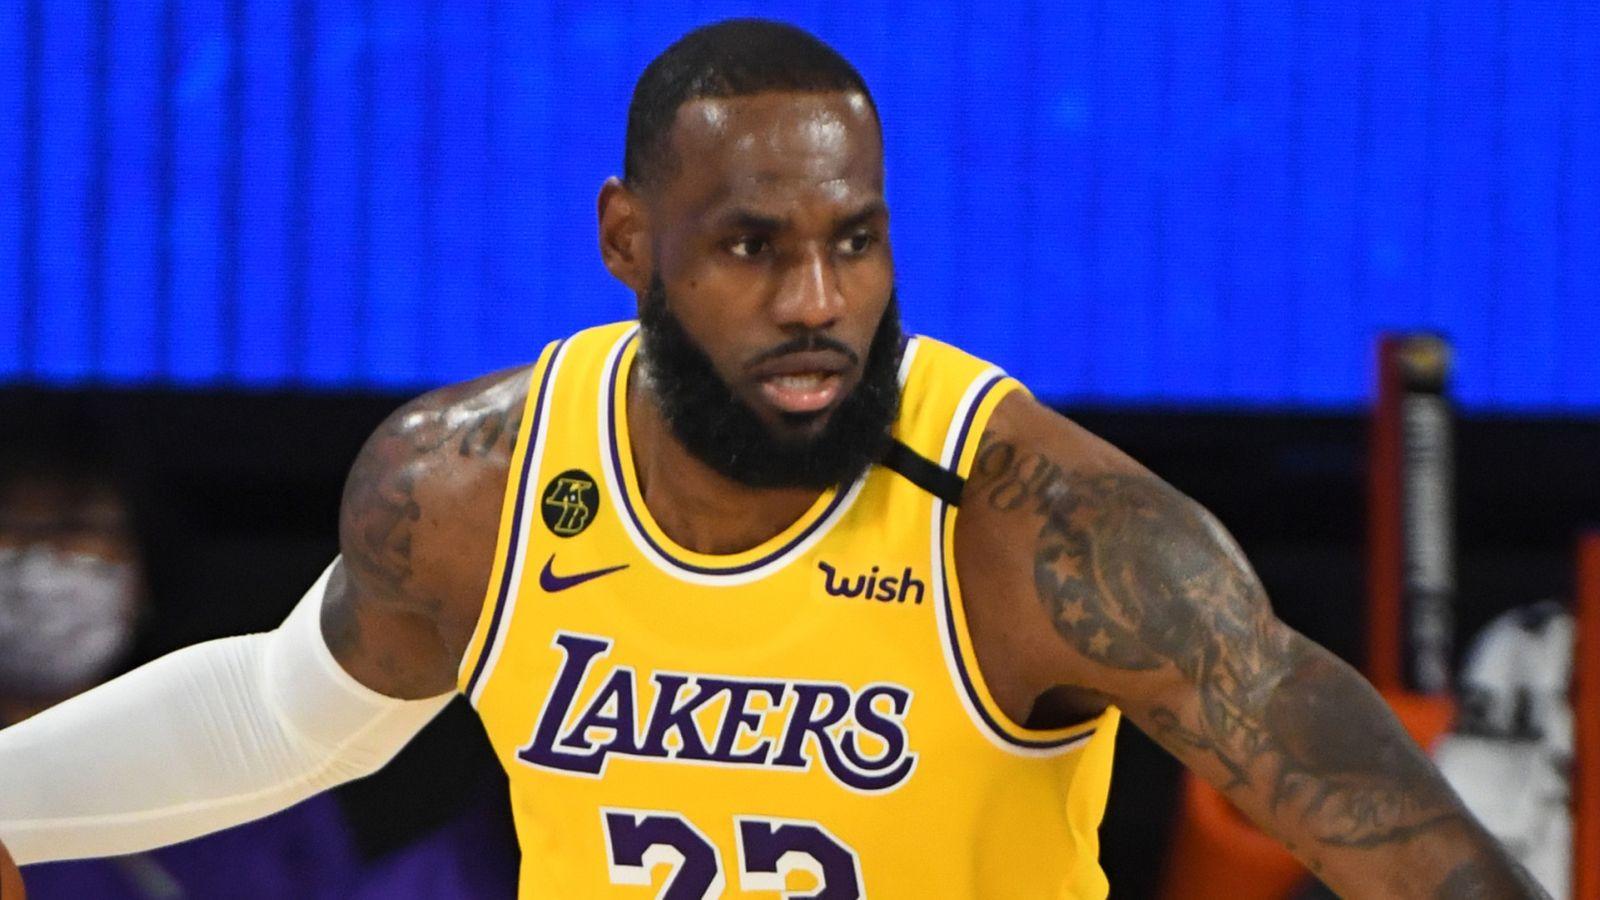 NBA gamers 'agree to resume postseason' | NBA News